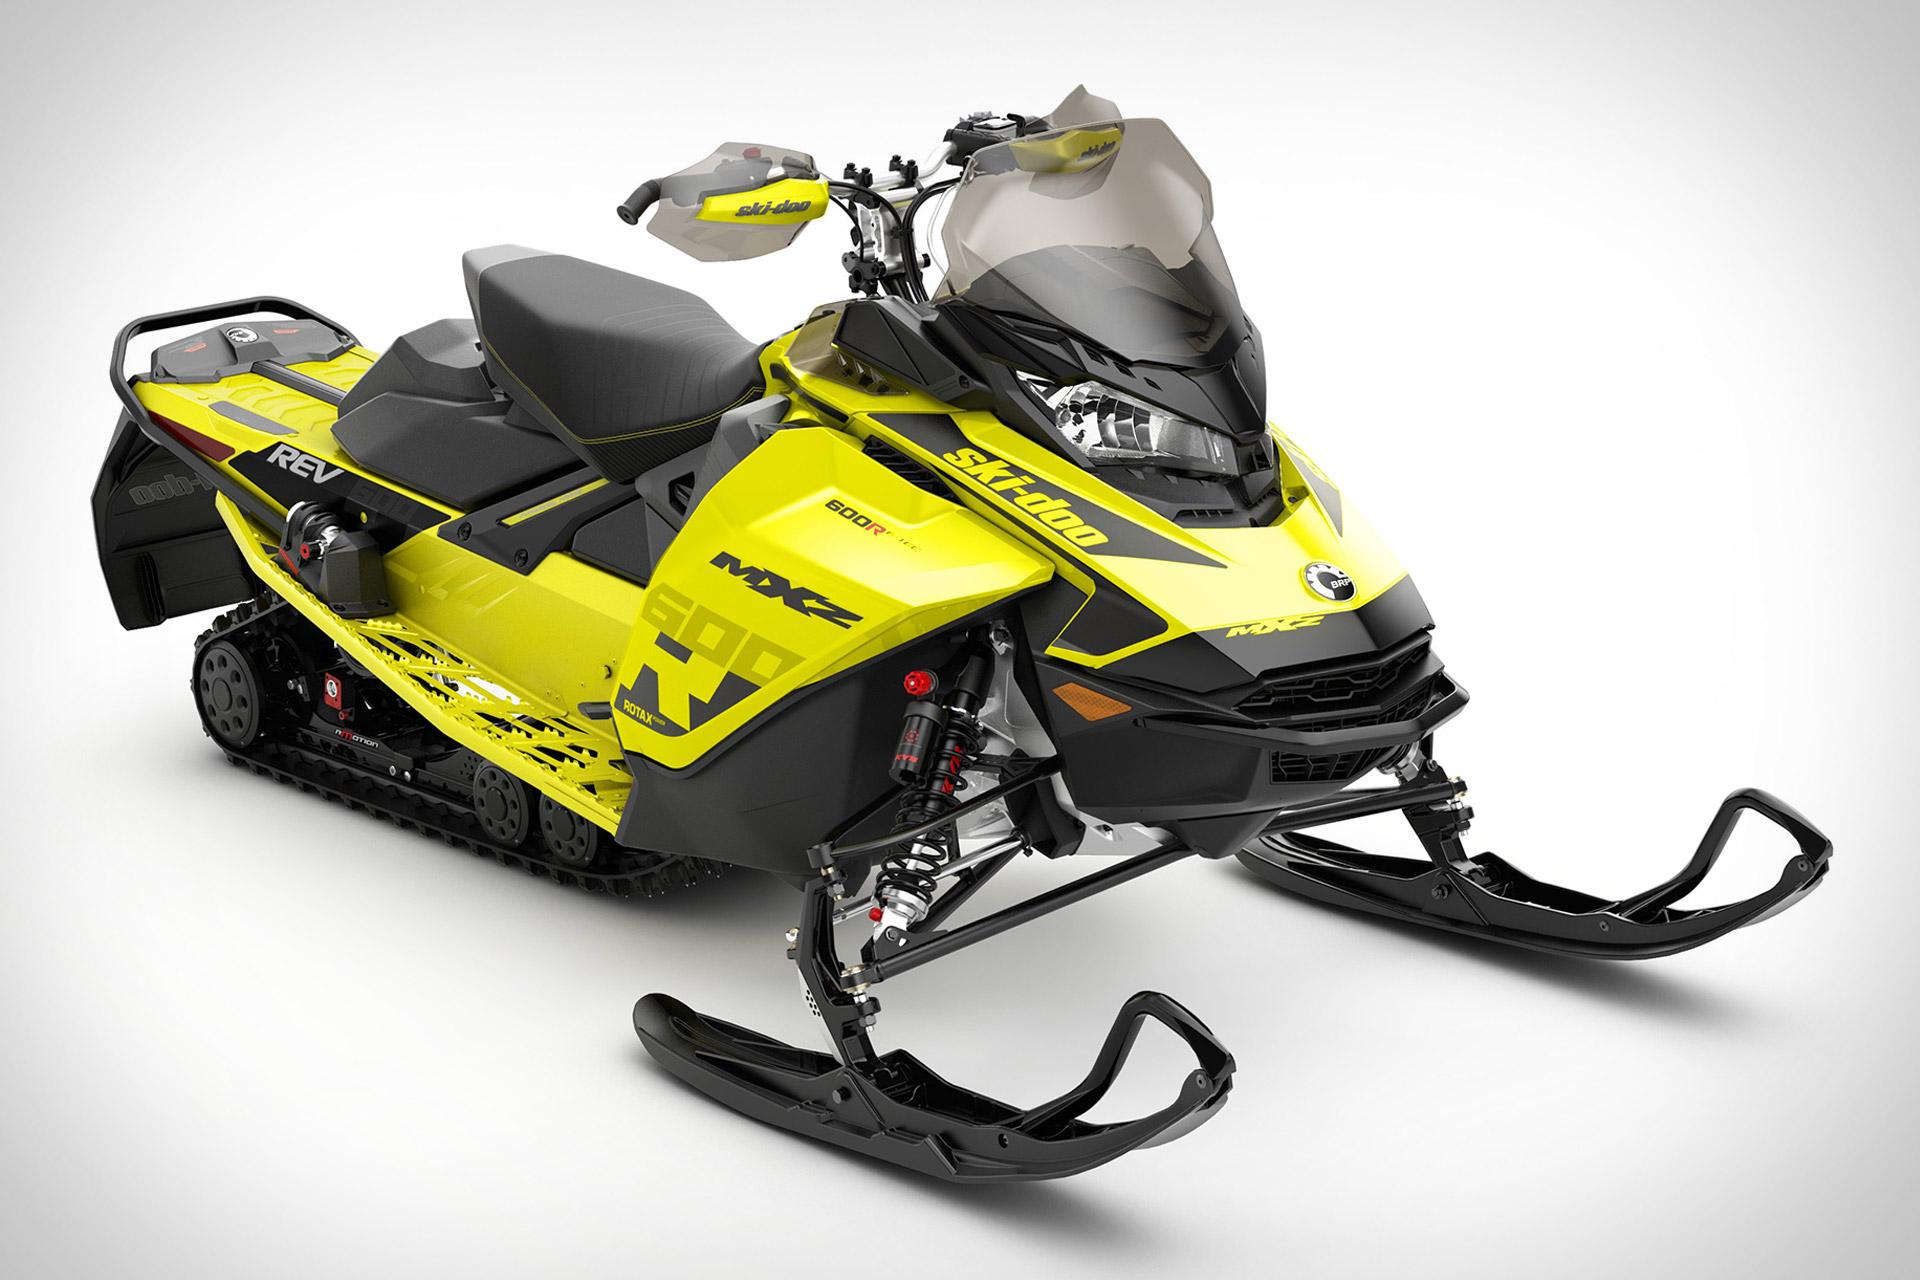 Ski-Doo MXZ 600R E-TEC Snowmobile